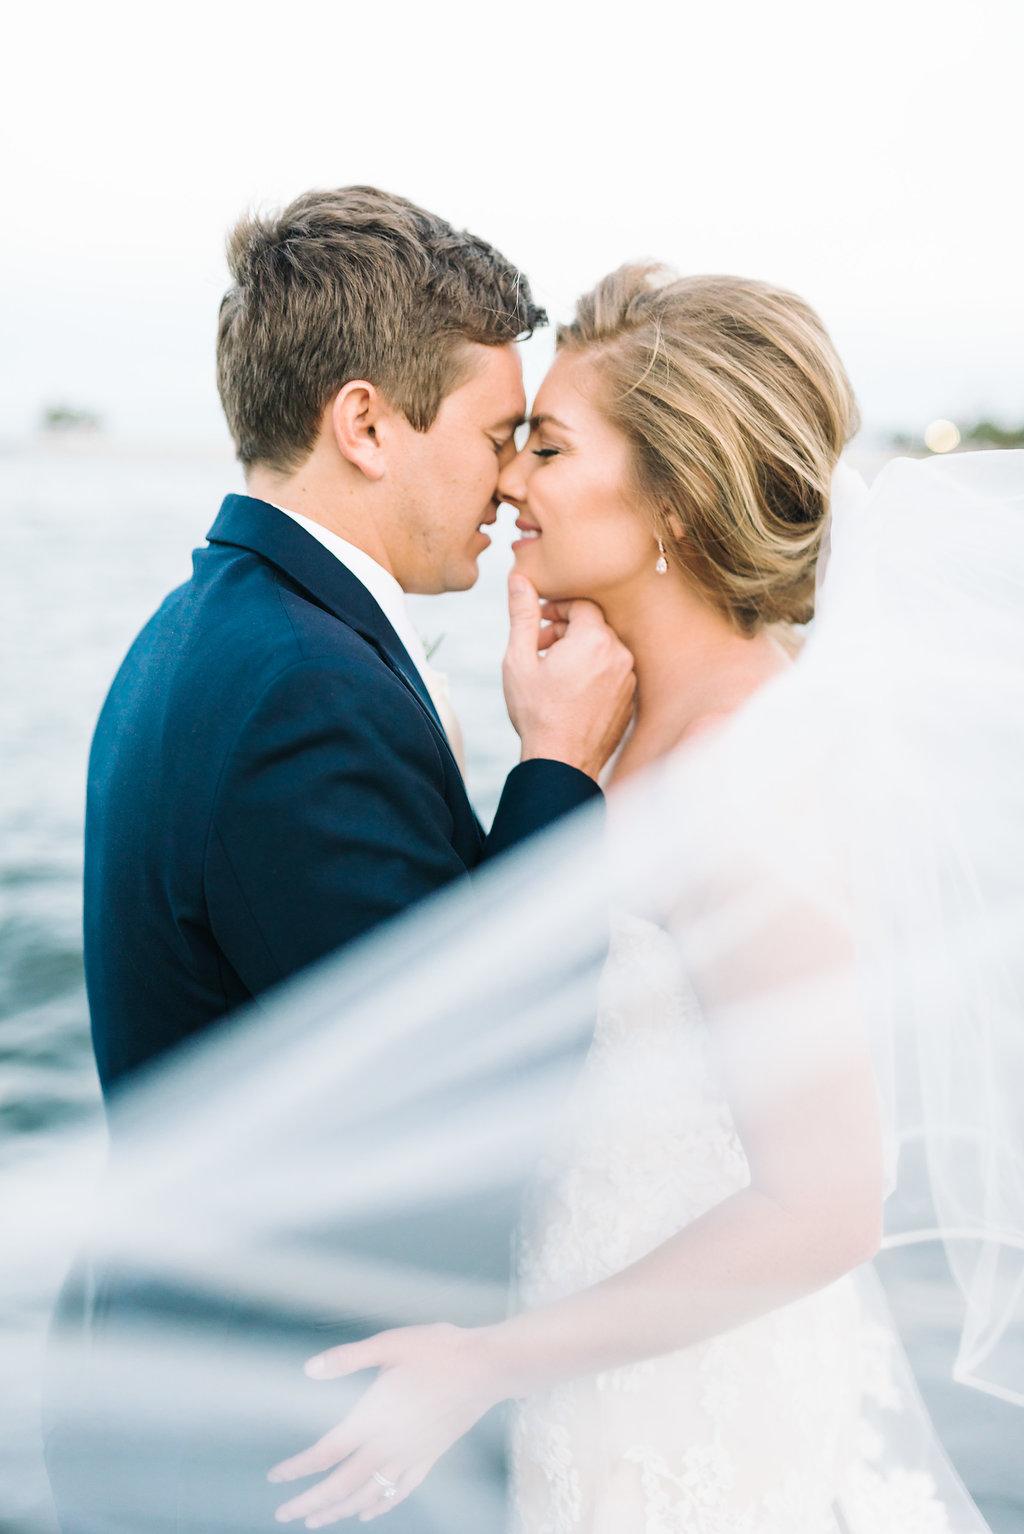 Outdoor Downtown St. Pete Waterfront Wedding Portrait, Bride wearing Lace Sweetheart Strapless Enzoani Wedding Dress, Groom in Blue Suit